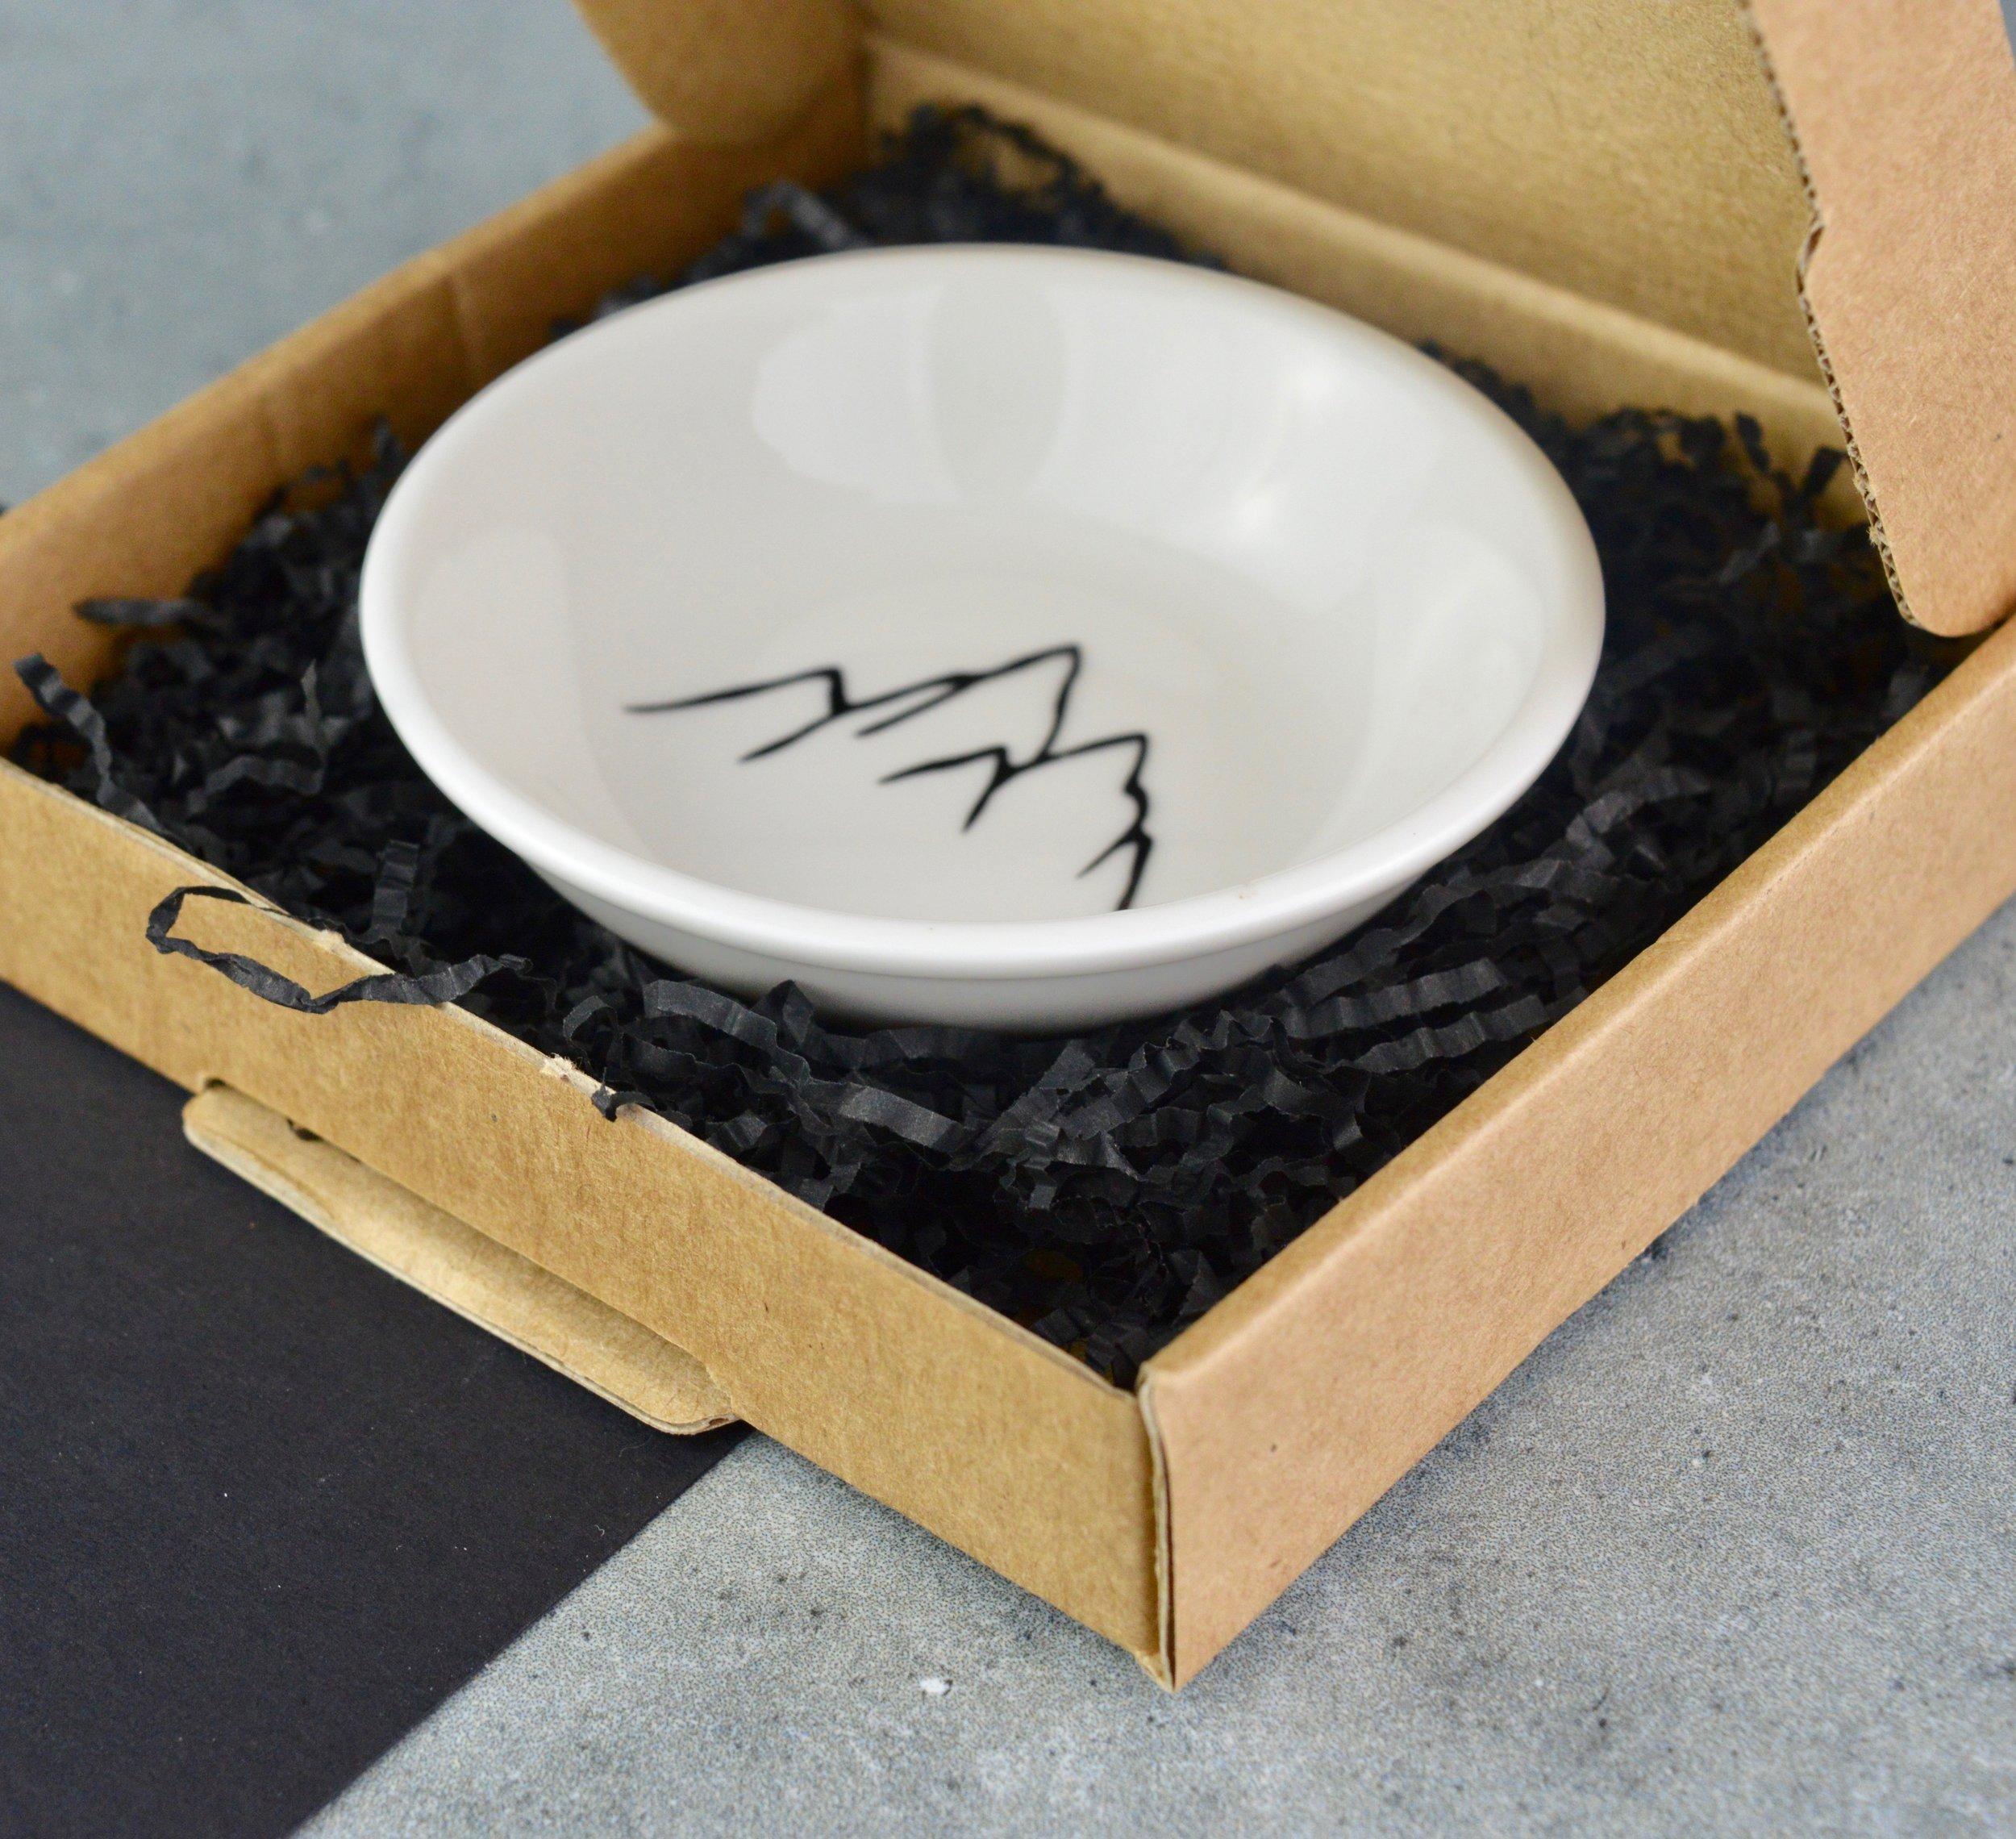 najb-mini-cufflink-dish-giftbox.jpg